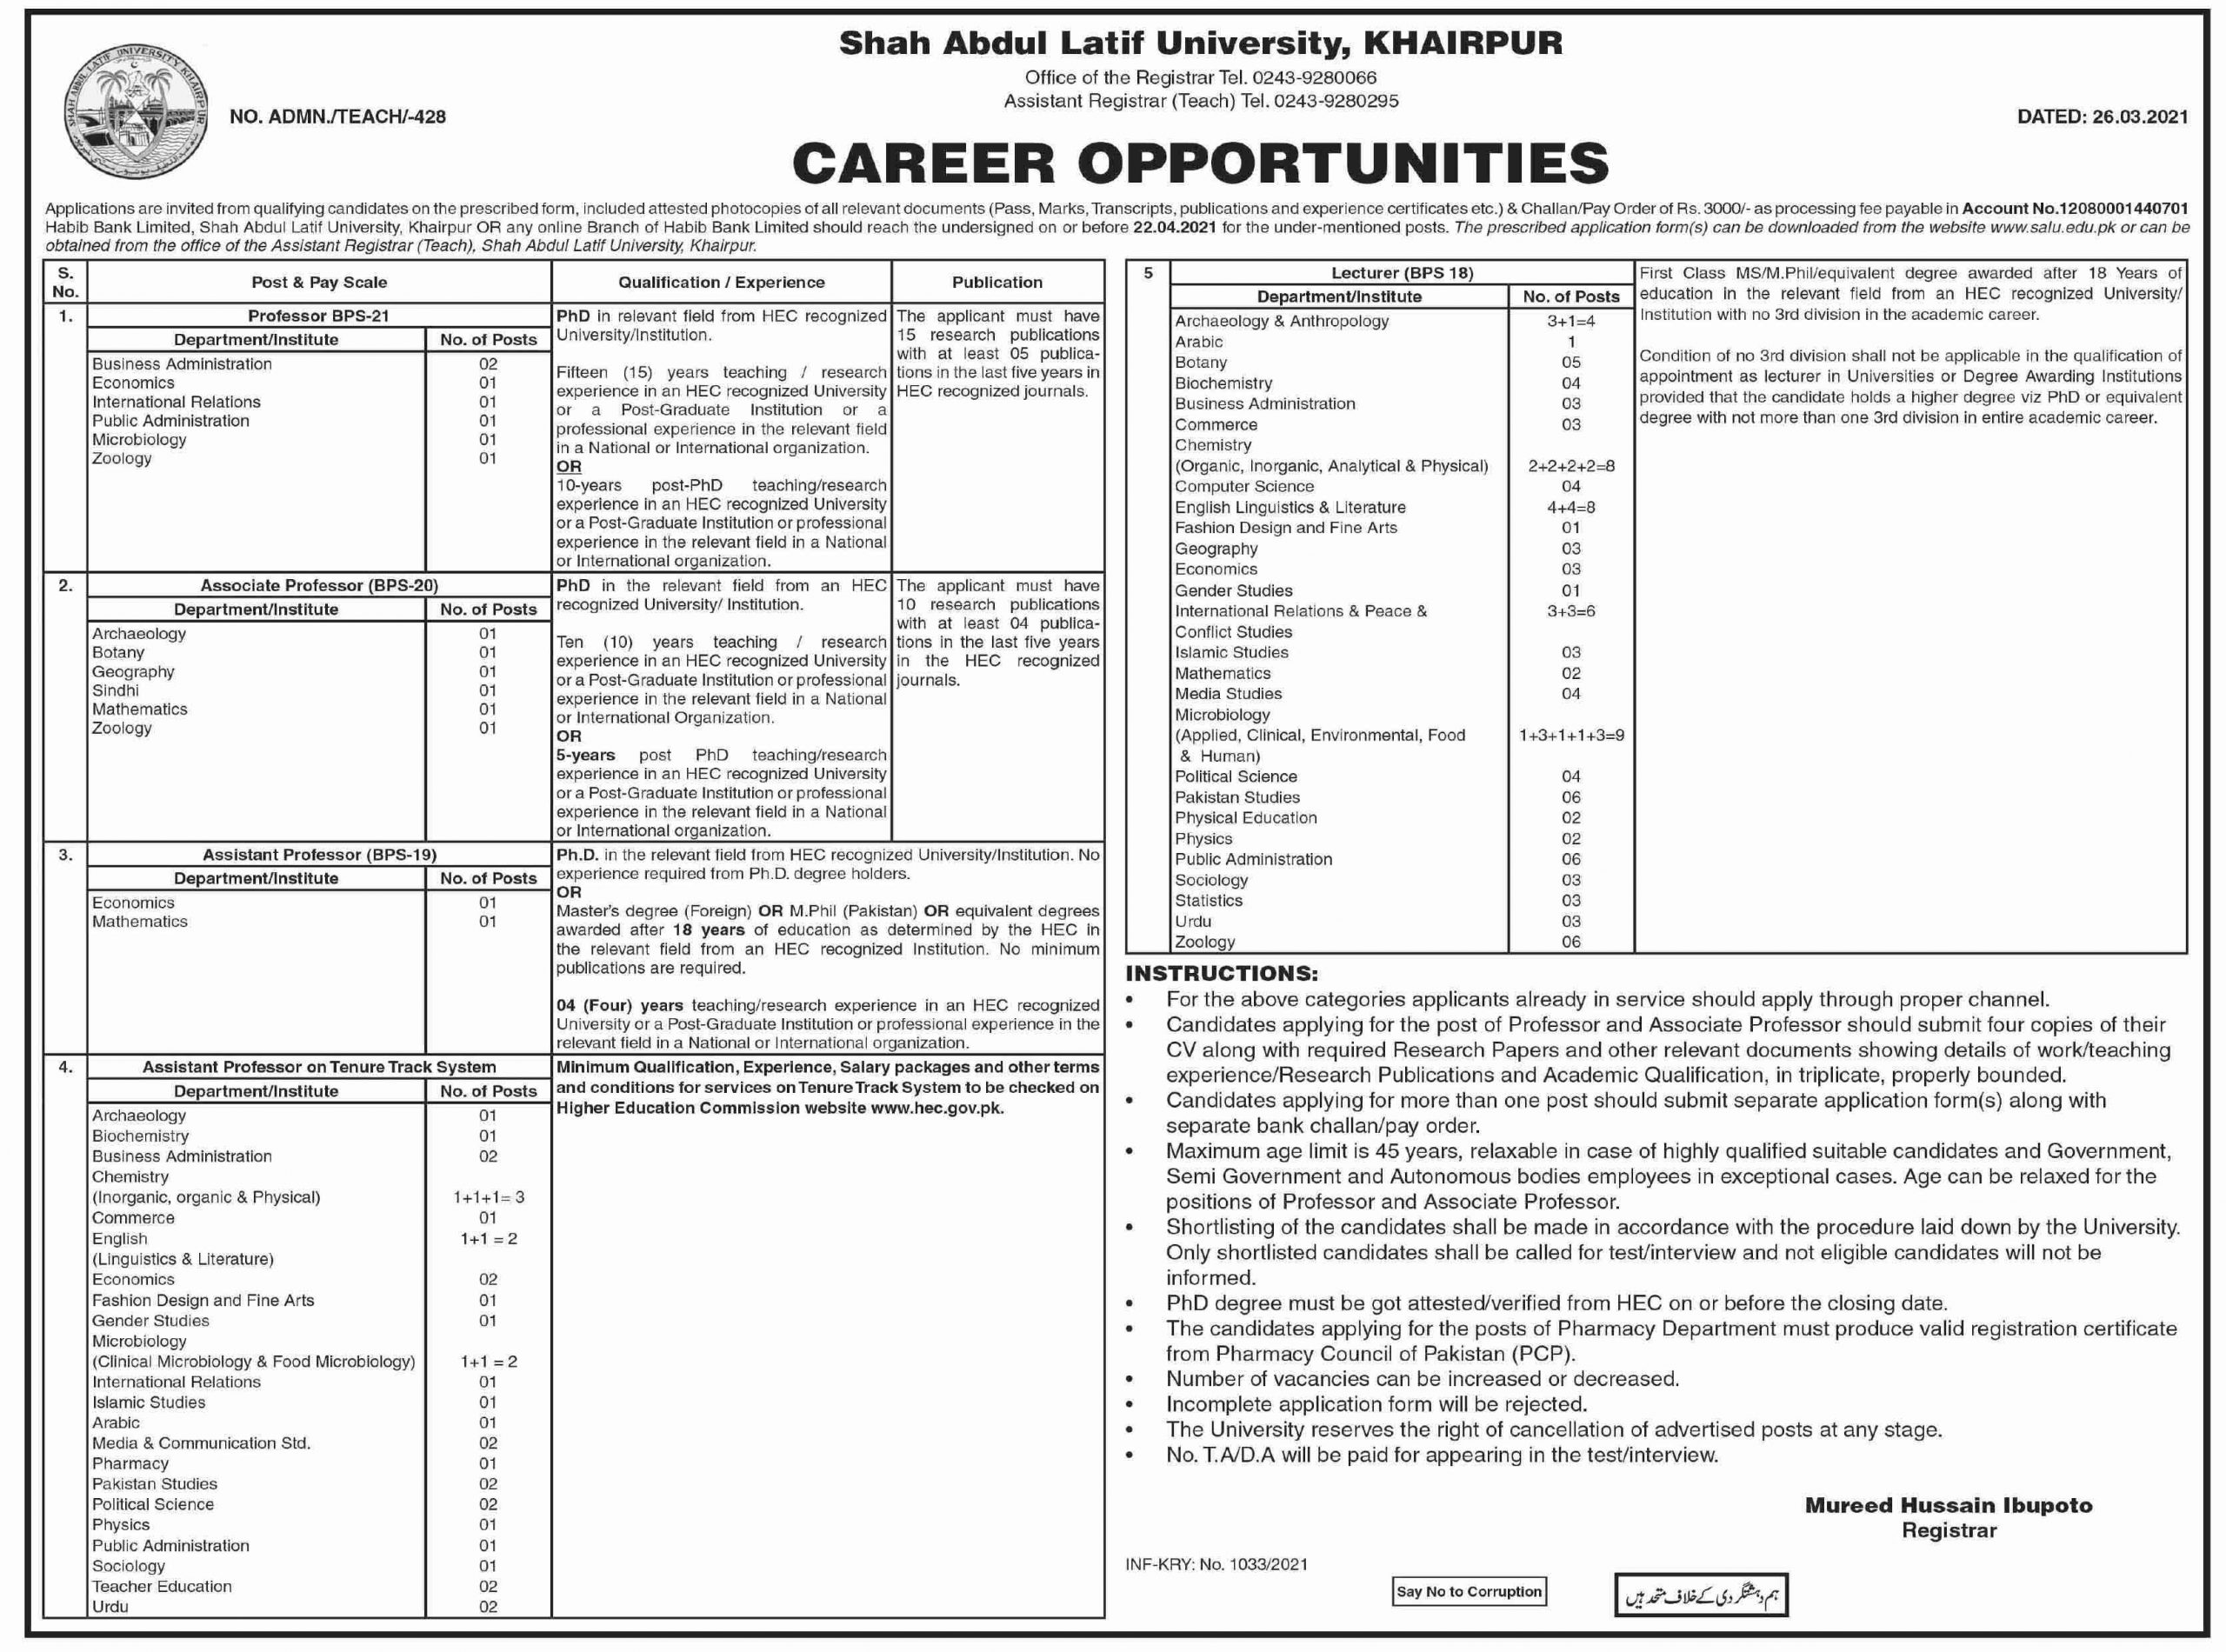 Shah Abdul Latif University Khairpur Jobs March 2021 (155 Posts)